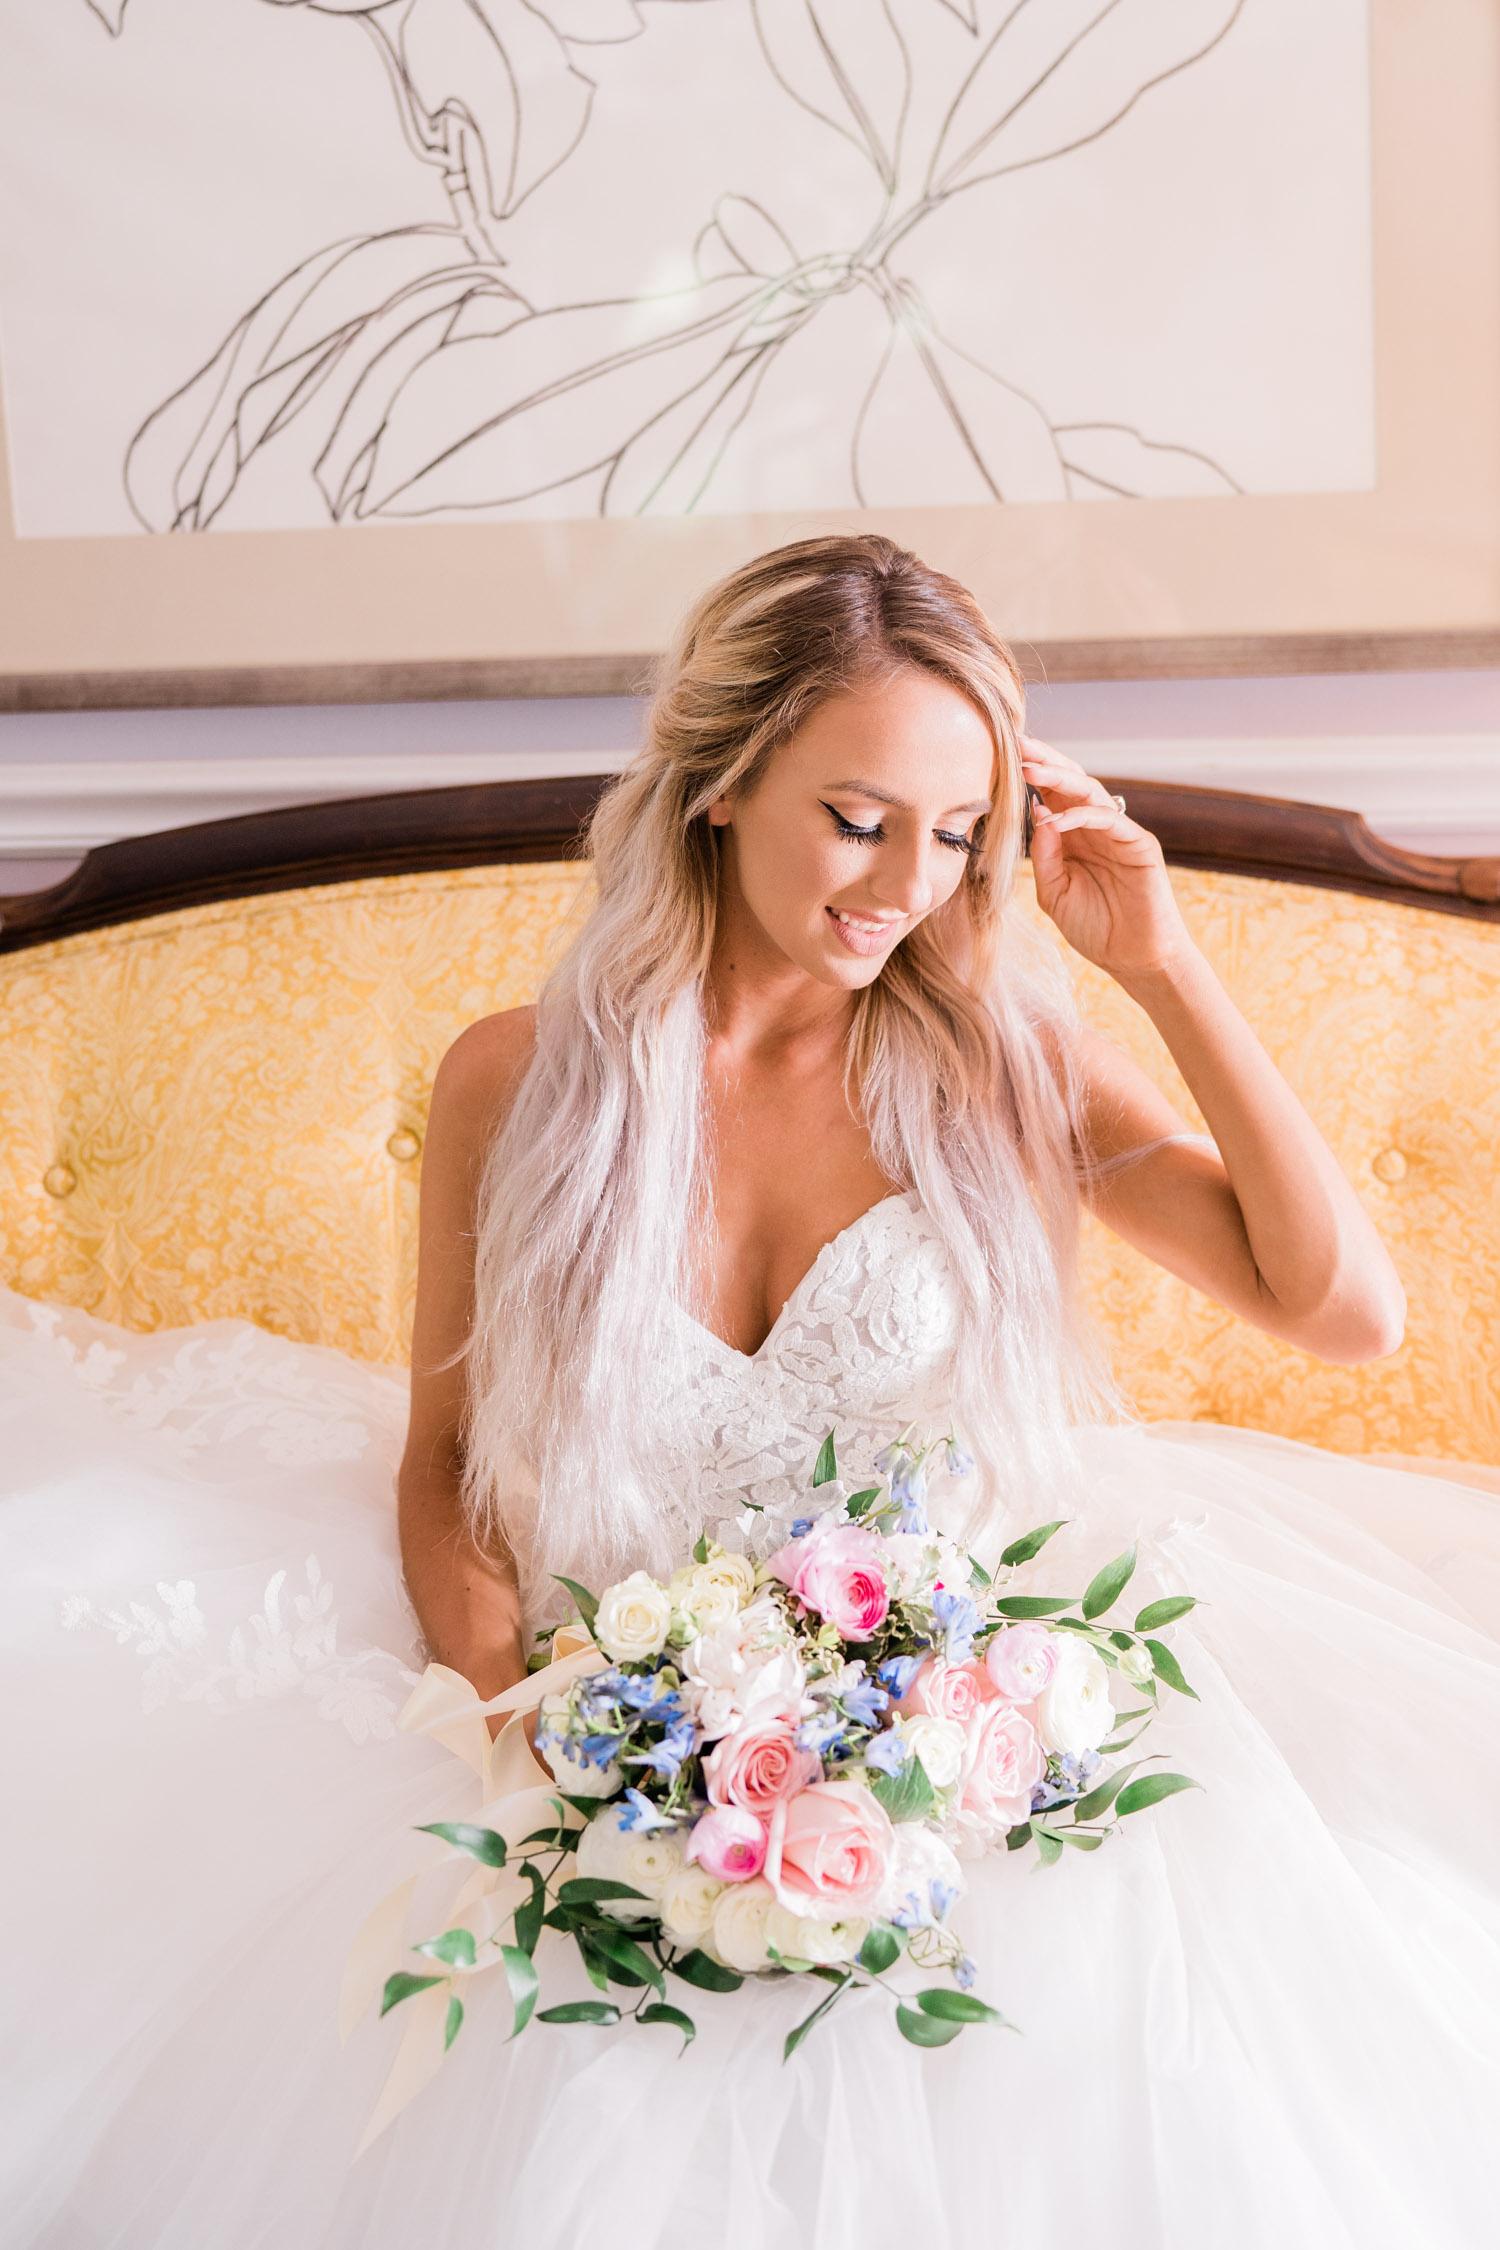 Styled Wedding & Engagement Shoot06913.jpg